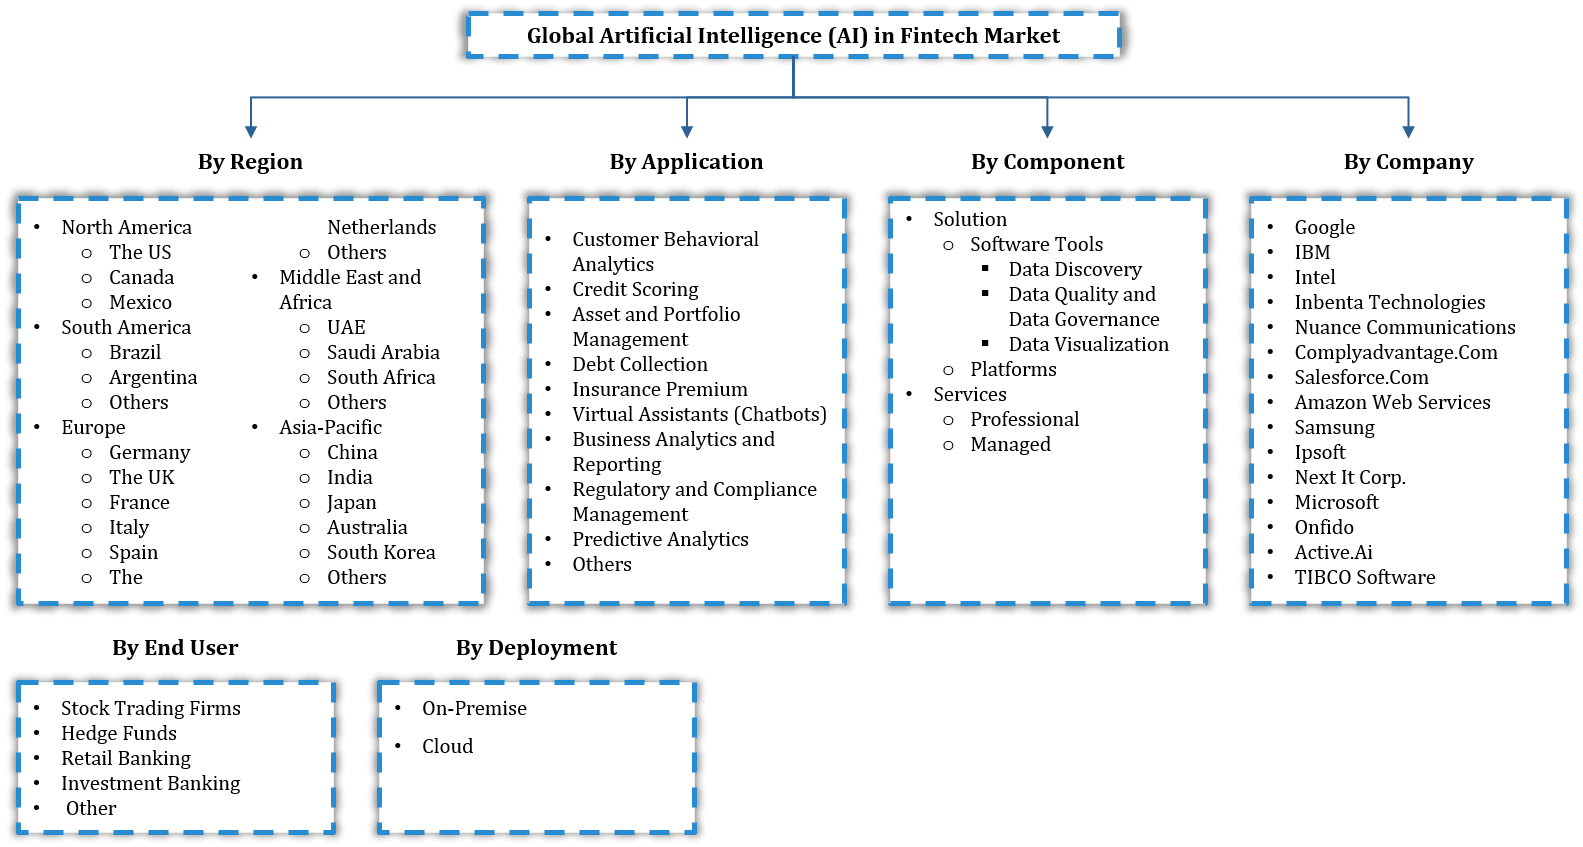 Artificial Intelligence (AI) in Fintech Market Segmentation